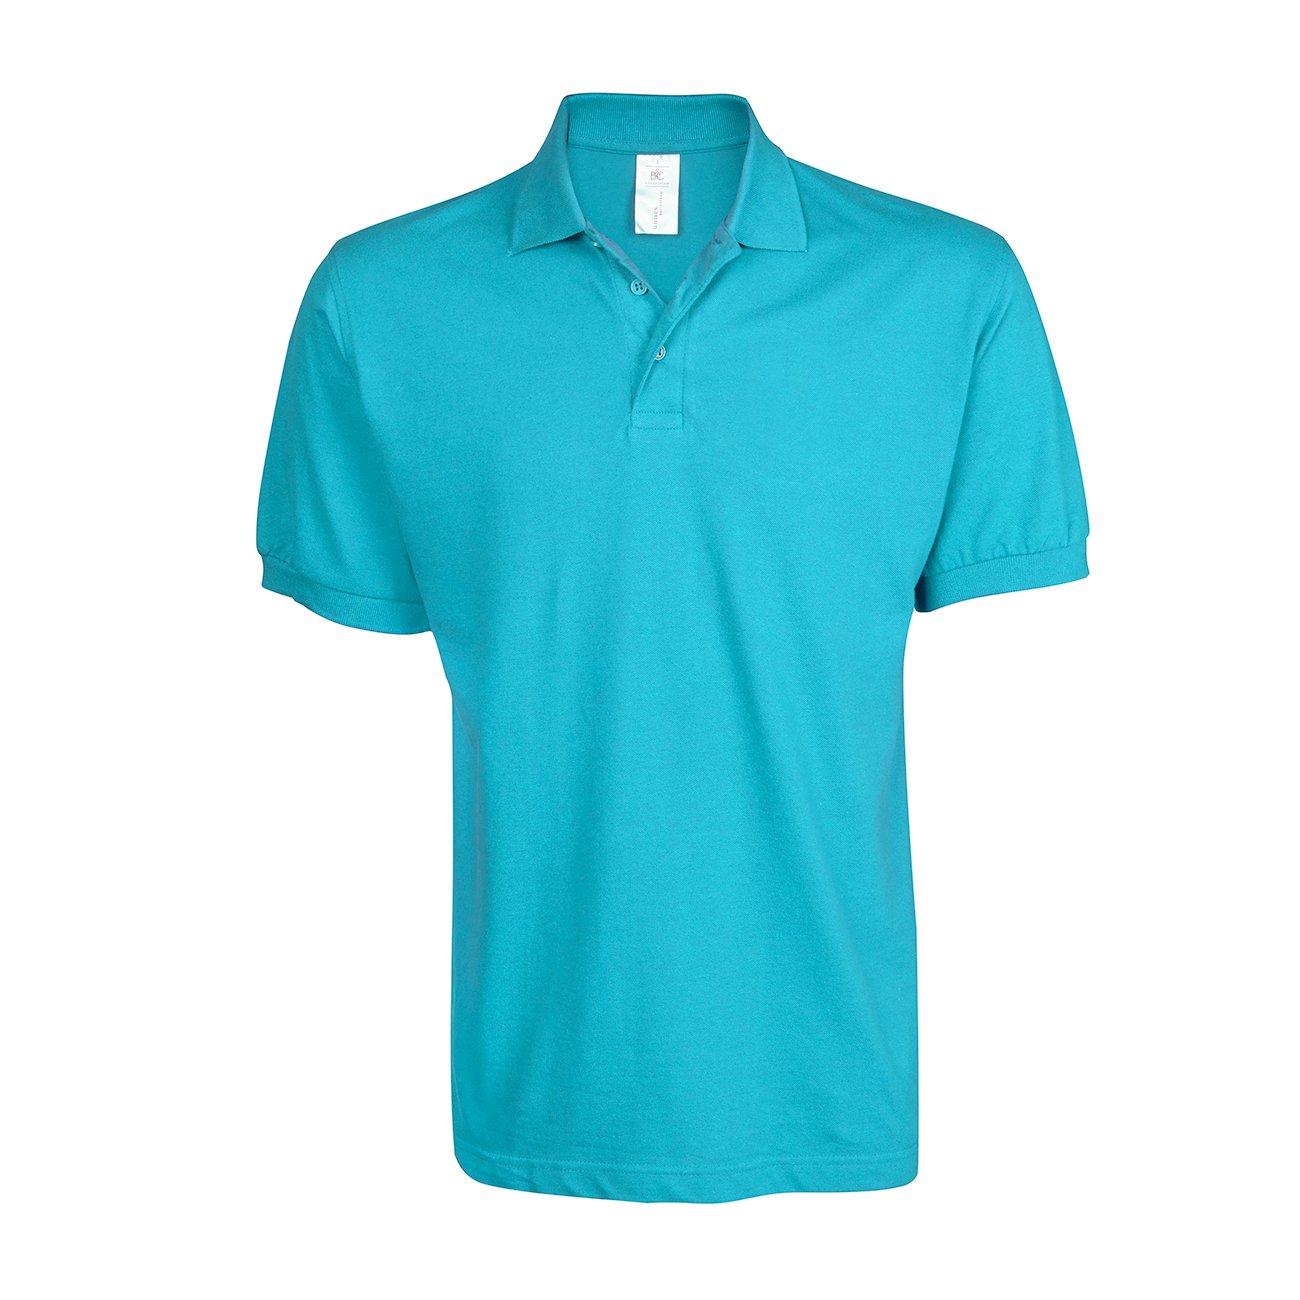 Mens Polo Shirt Classic Plain Big and Tall Plus Size T-Shirts